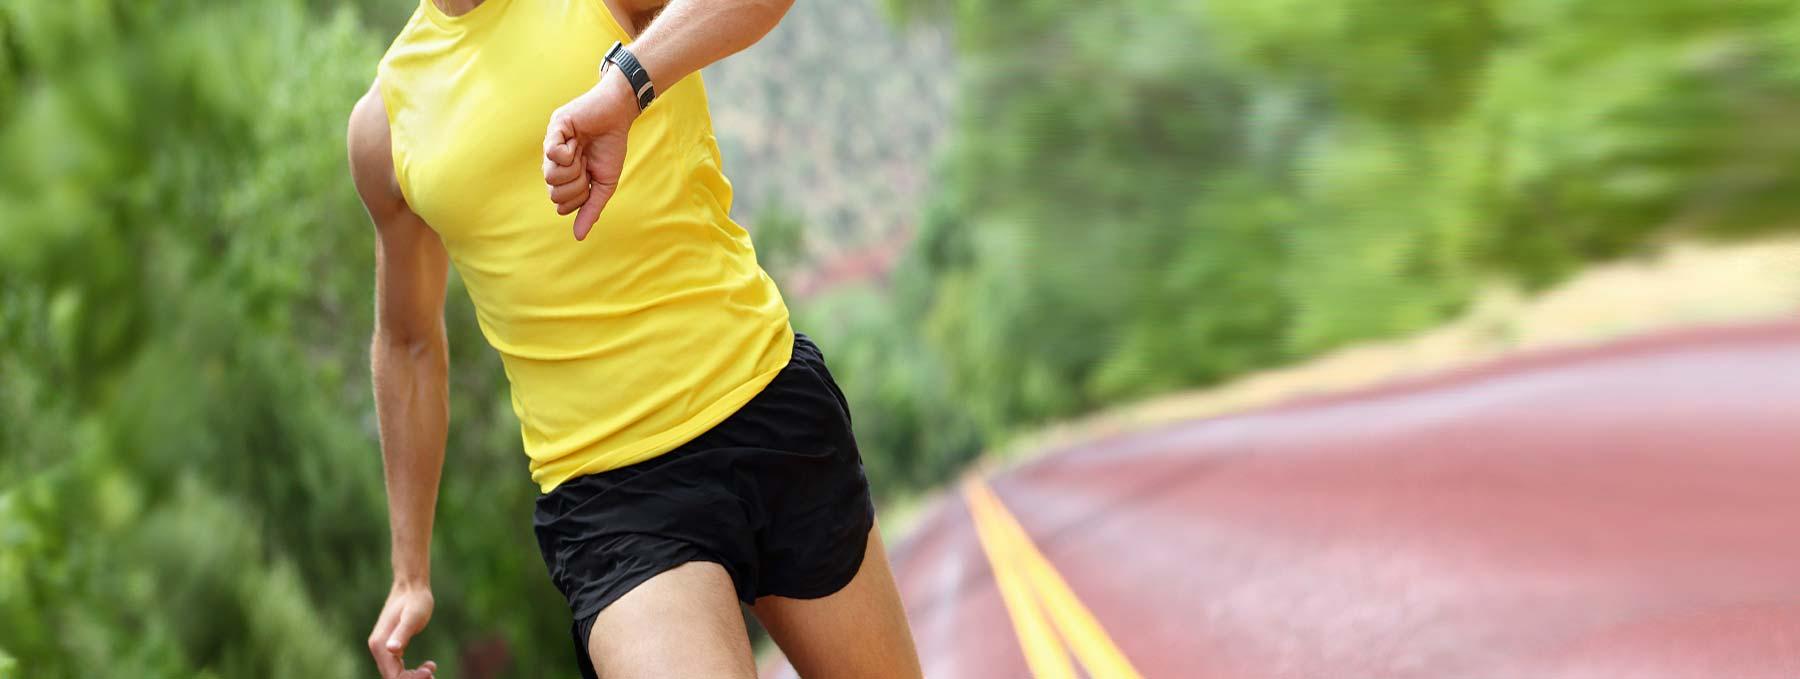 how circadian rhythms determine workout success chronobiology com